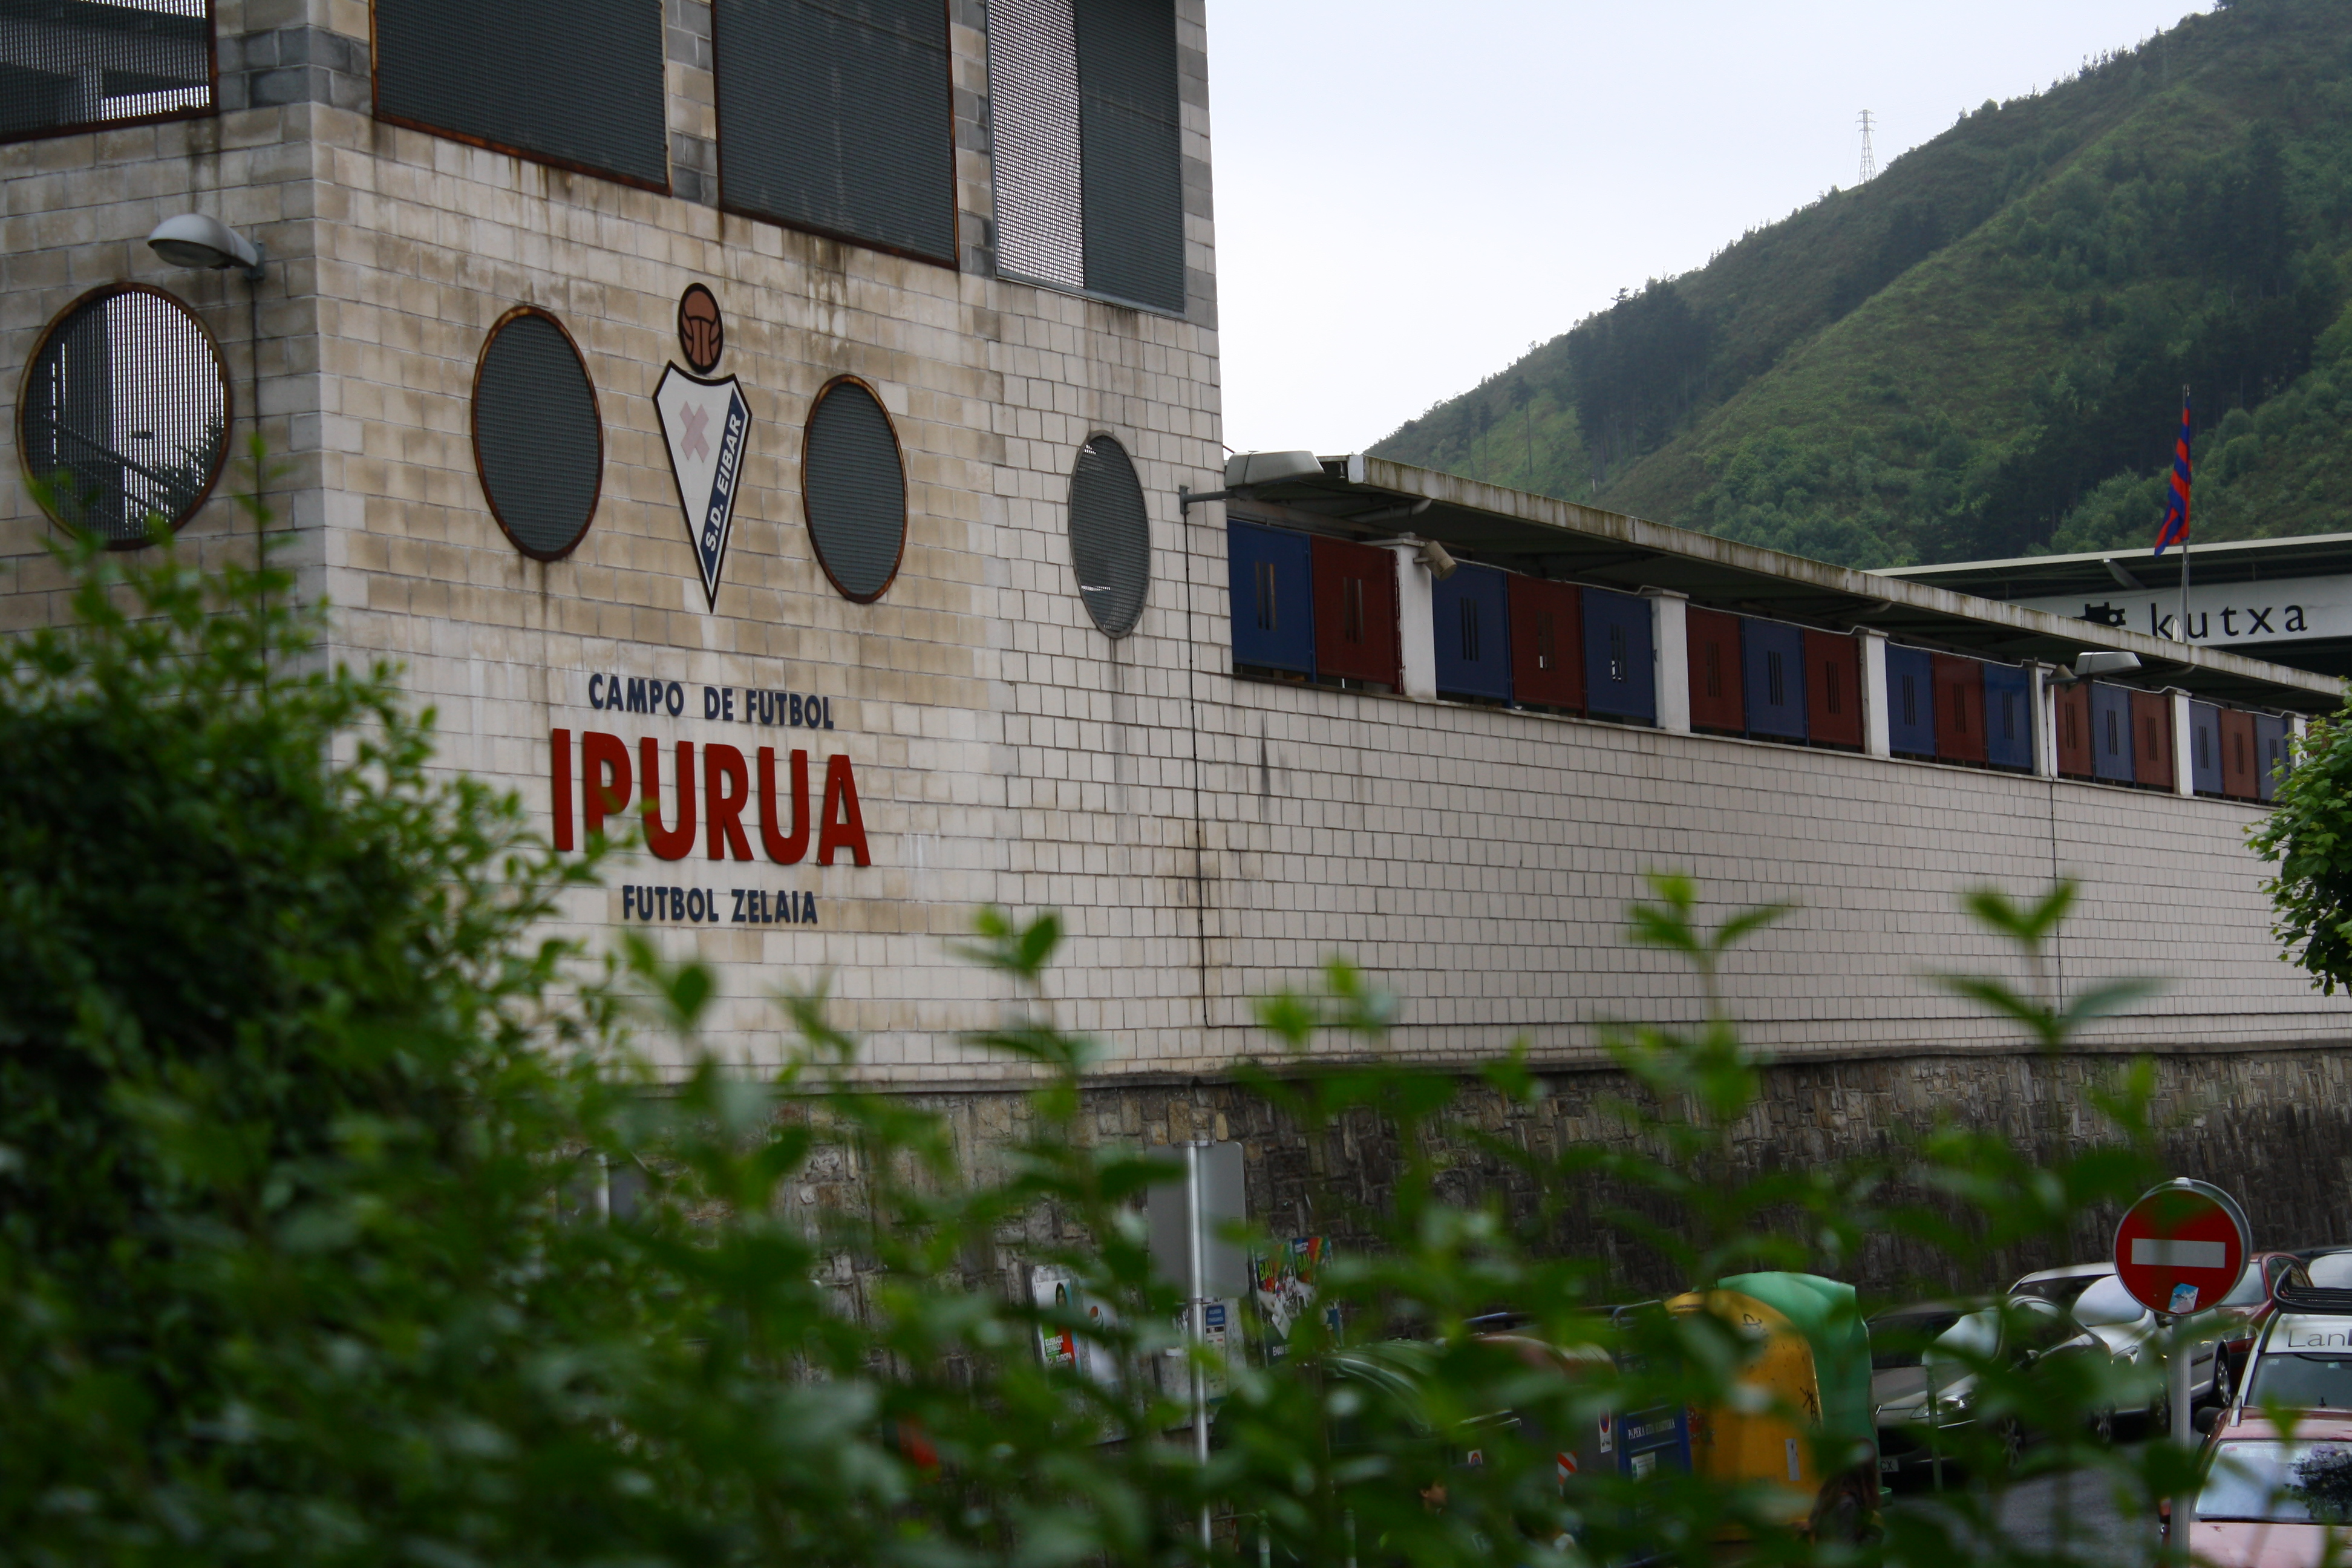 Campo de fútbol del Eibar, Ipurua